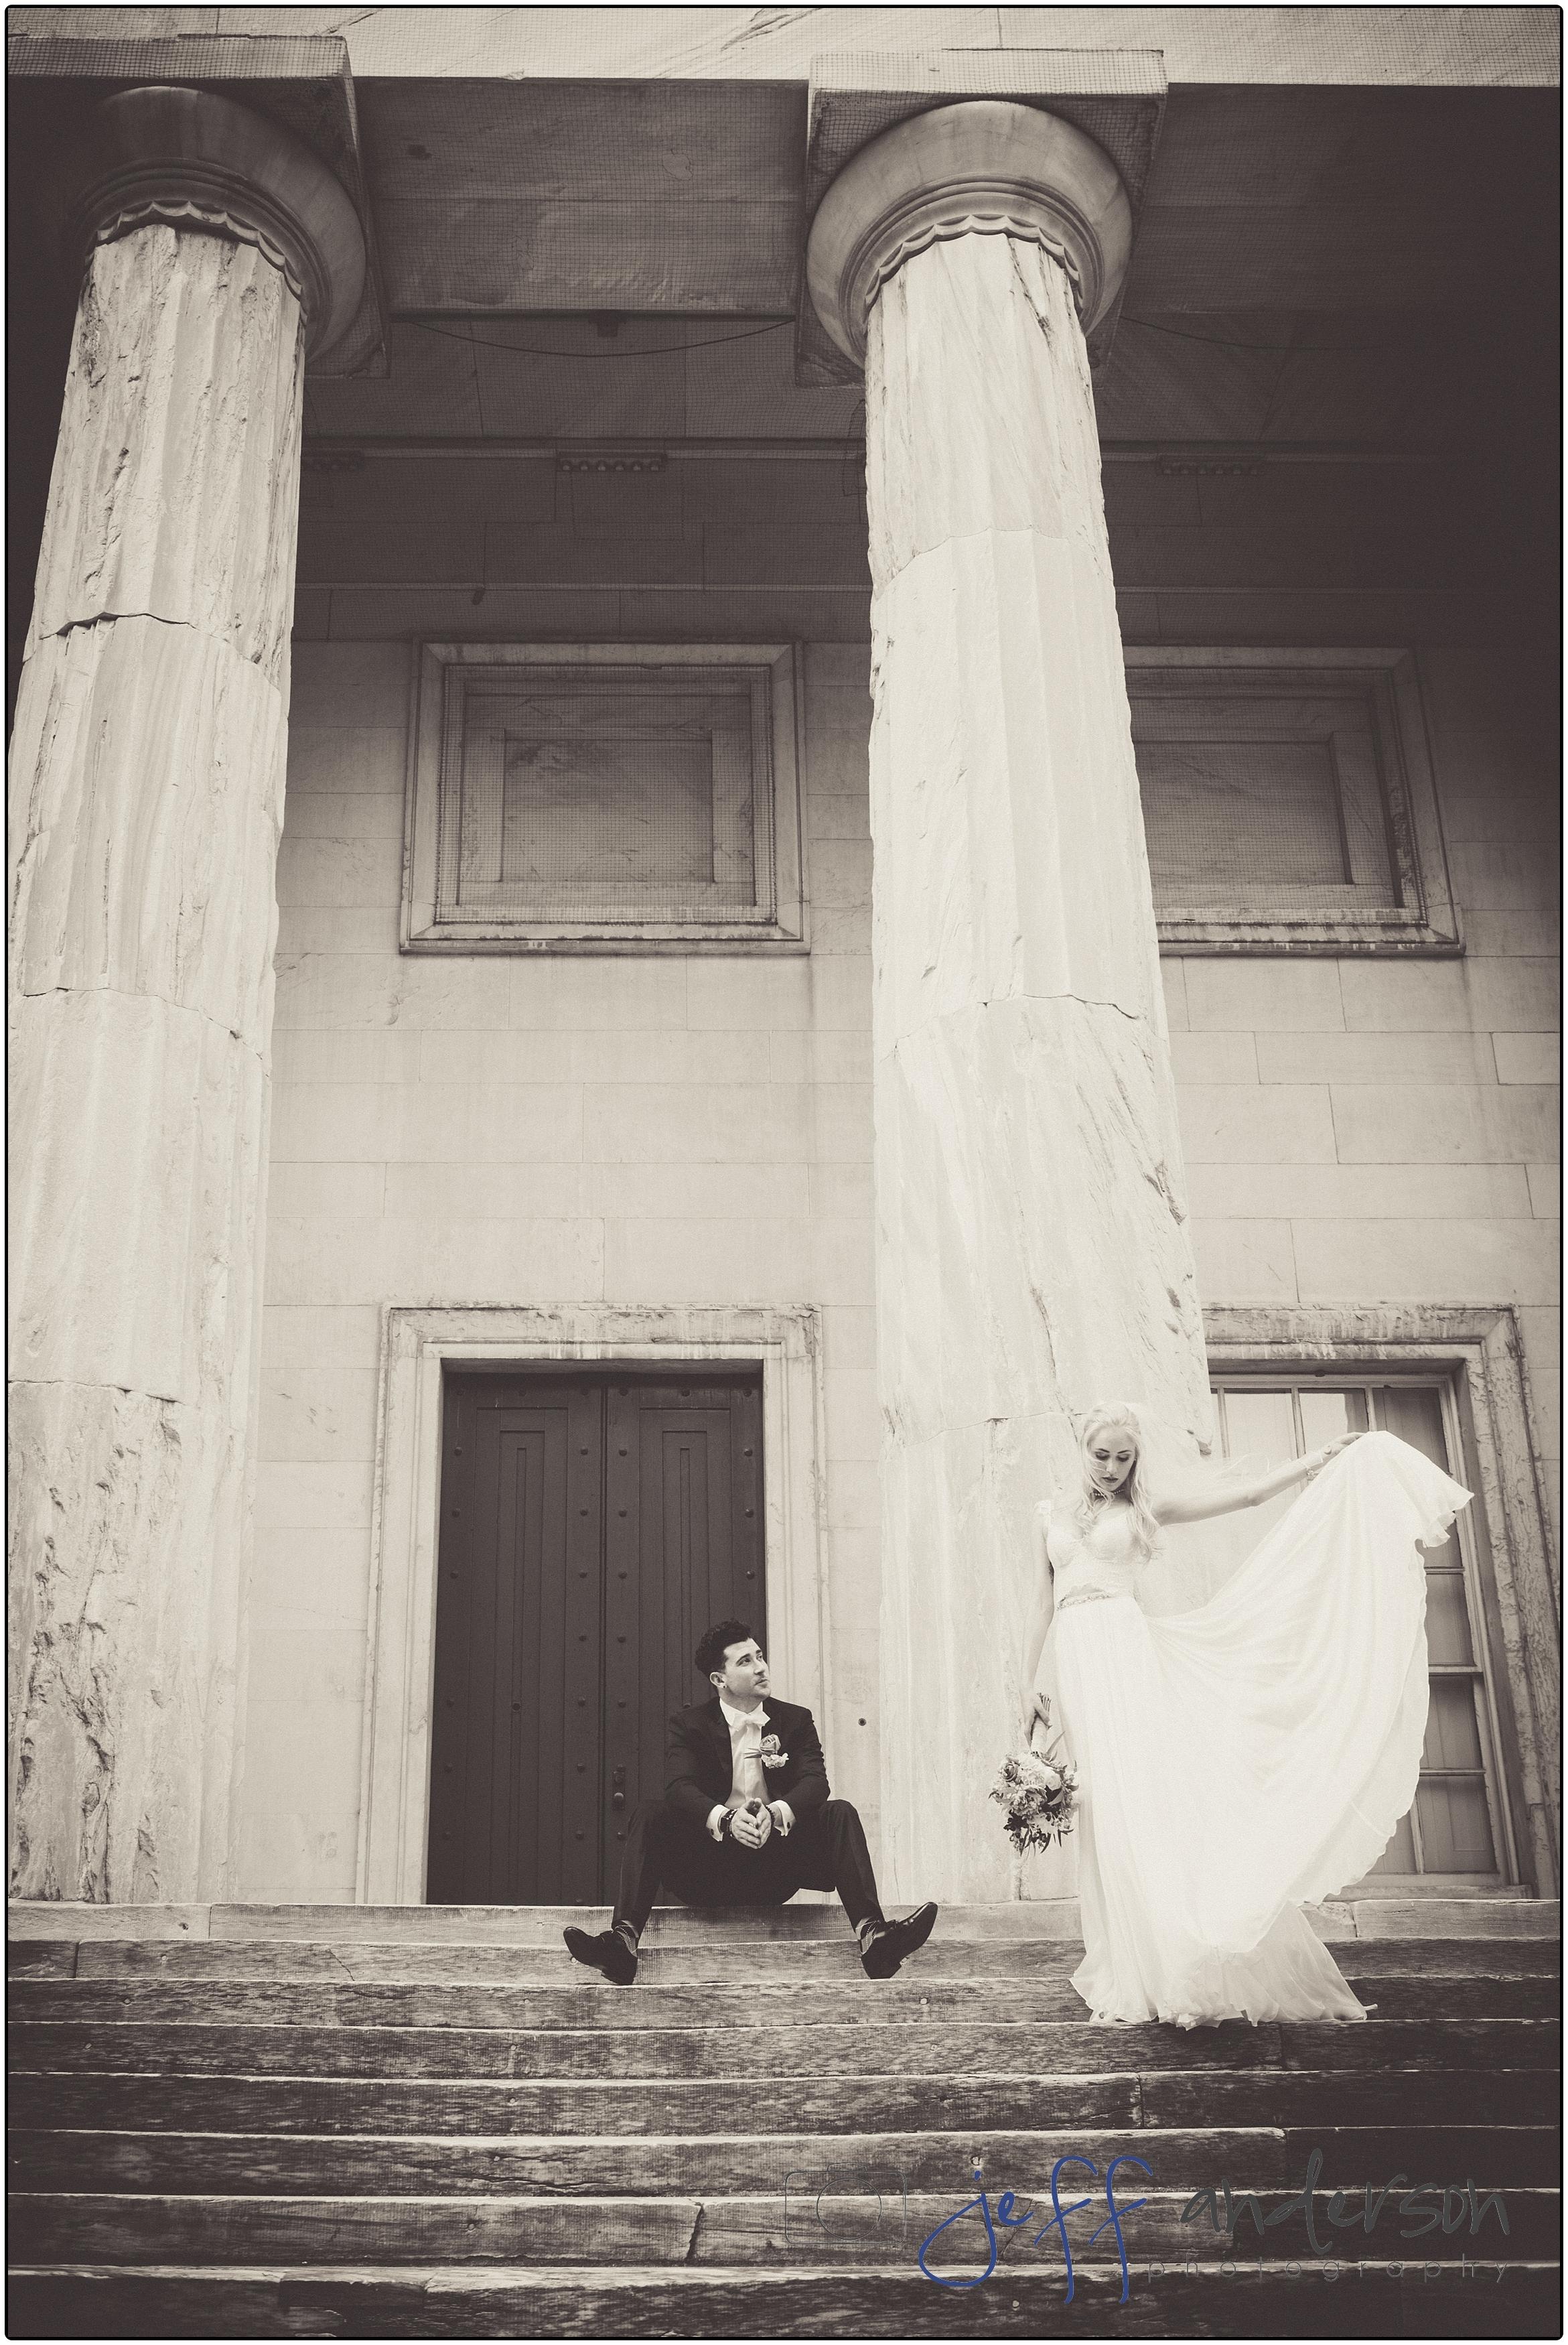 destination wedding photographer,hotel monaco philadelphia,jeff anderson photography,josh_shannon,old city philadelphia,philadelphia wedding photographer,second national bank. independence hall area,south jersey wedding photographer,wedding photography,